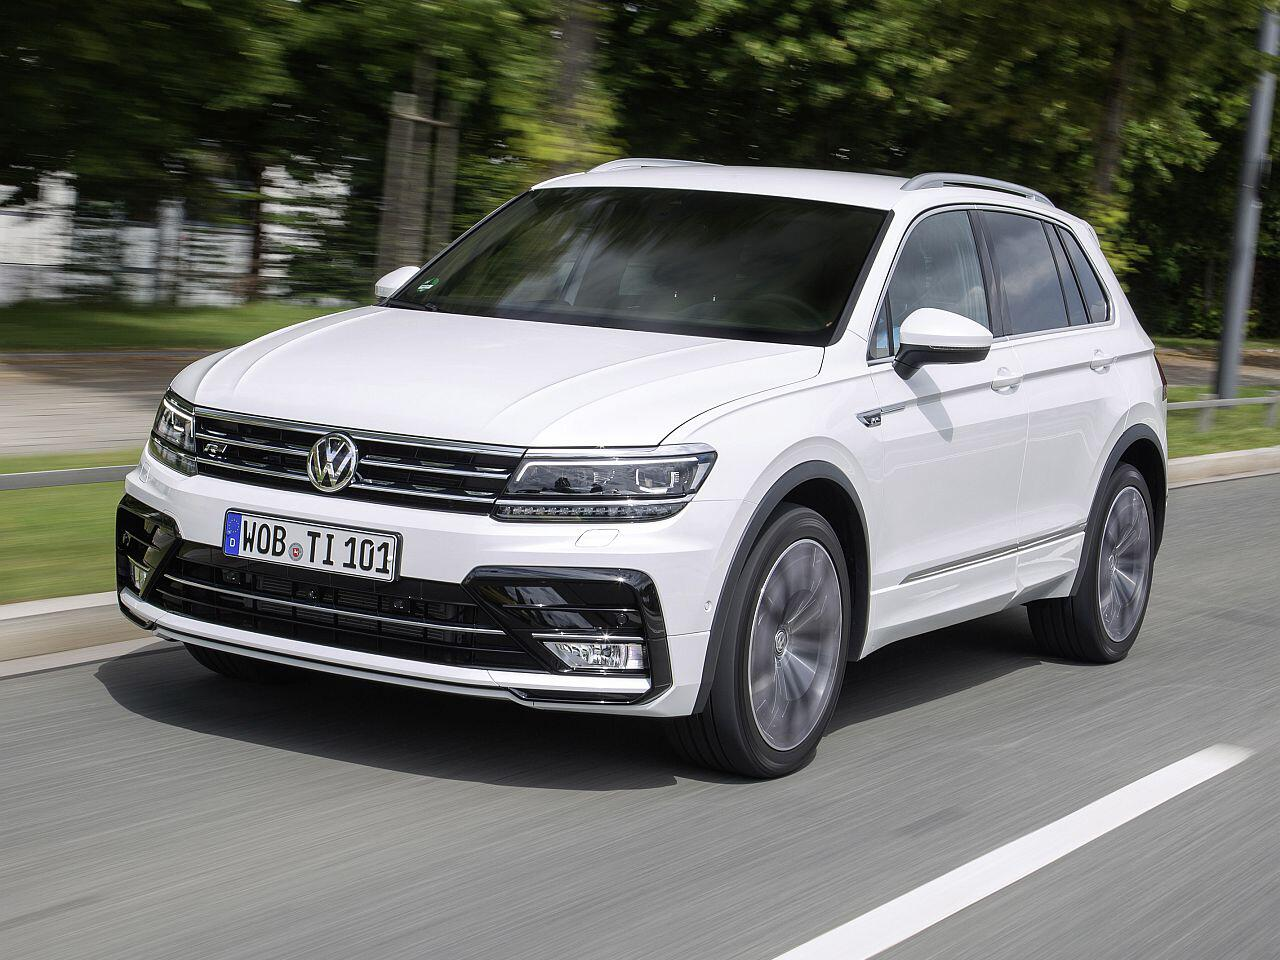 Bild zu Platz 1: VW Tiguan